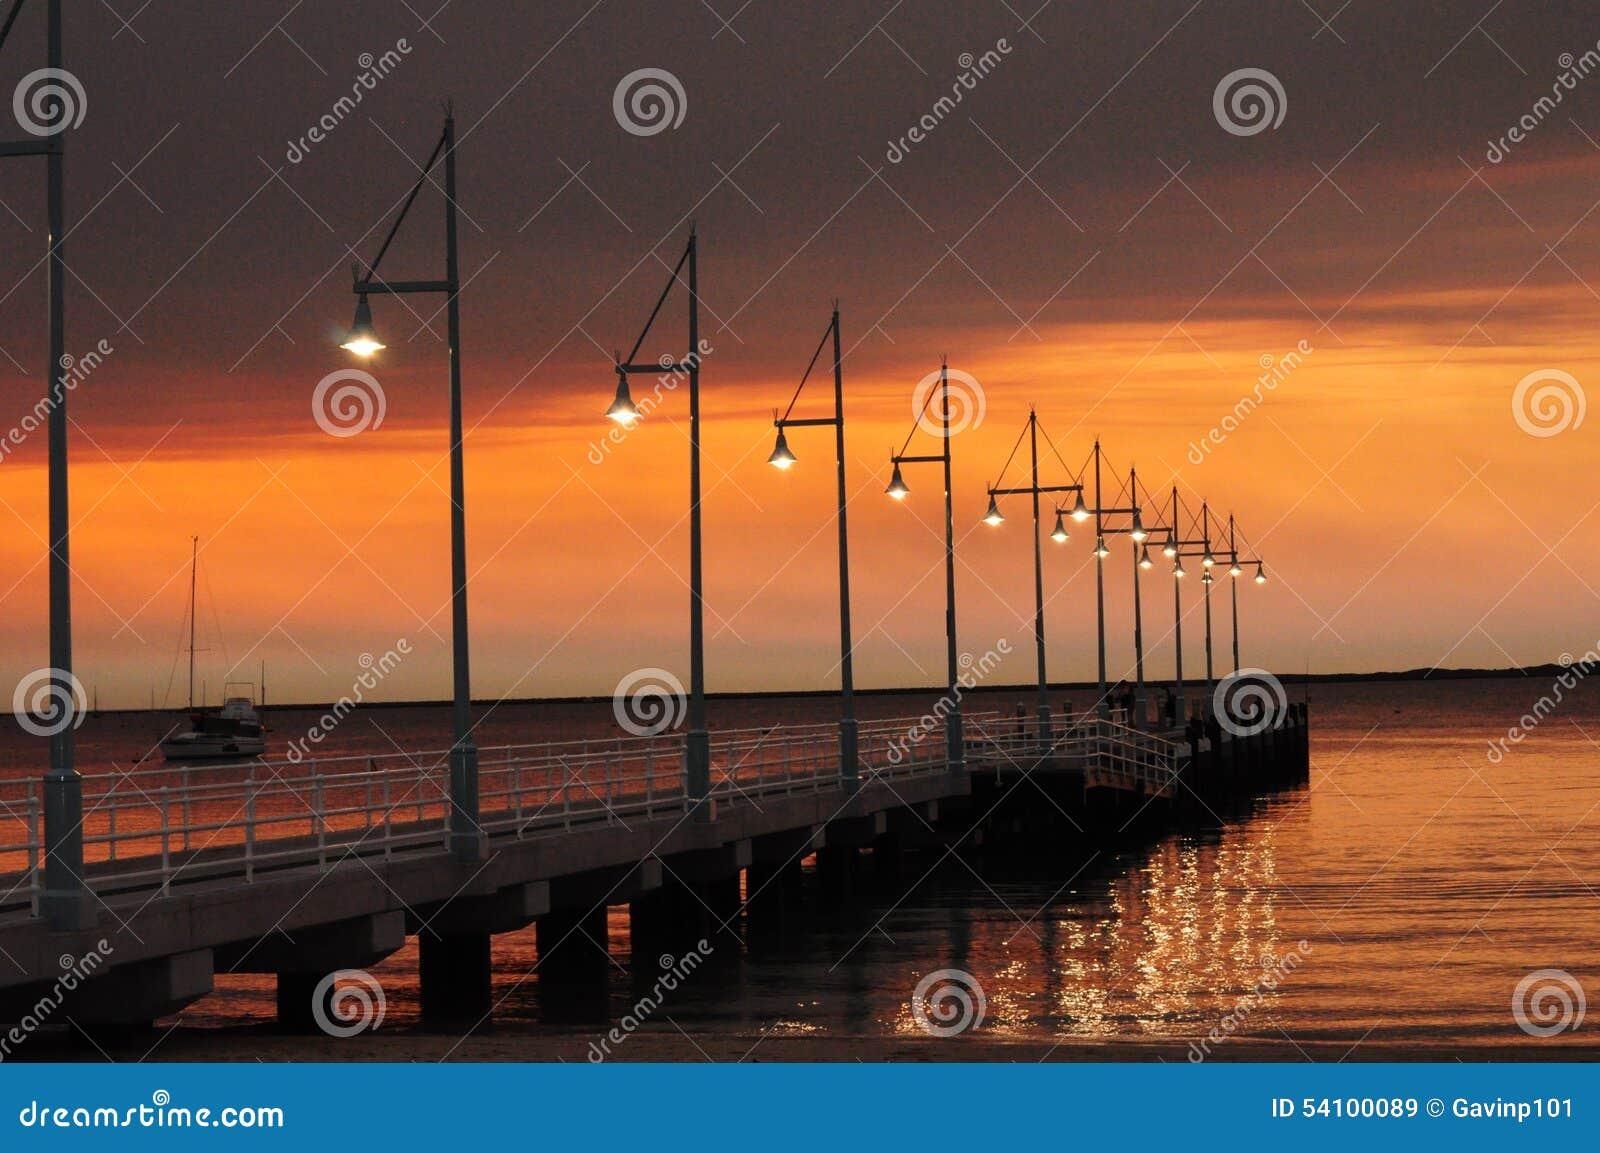 Pier with lights at sunset Perth Rockingham Western Australia